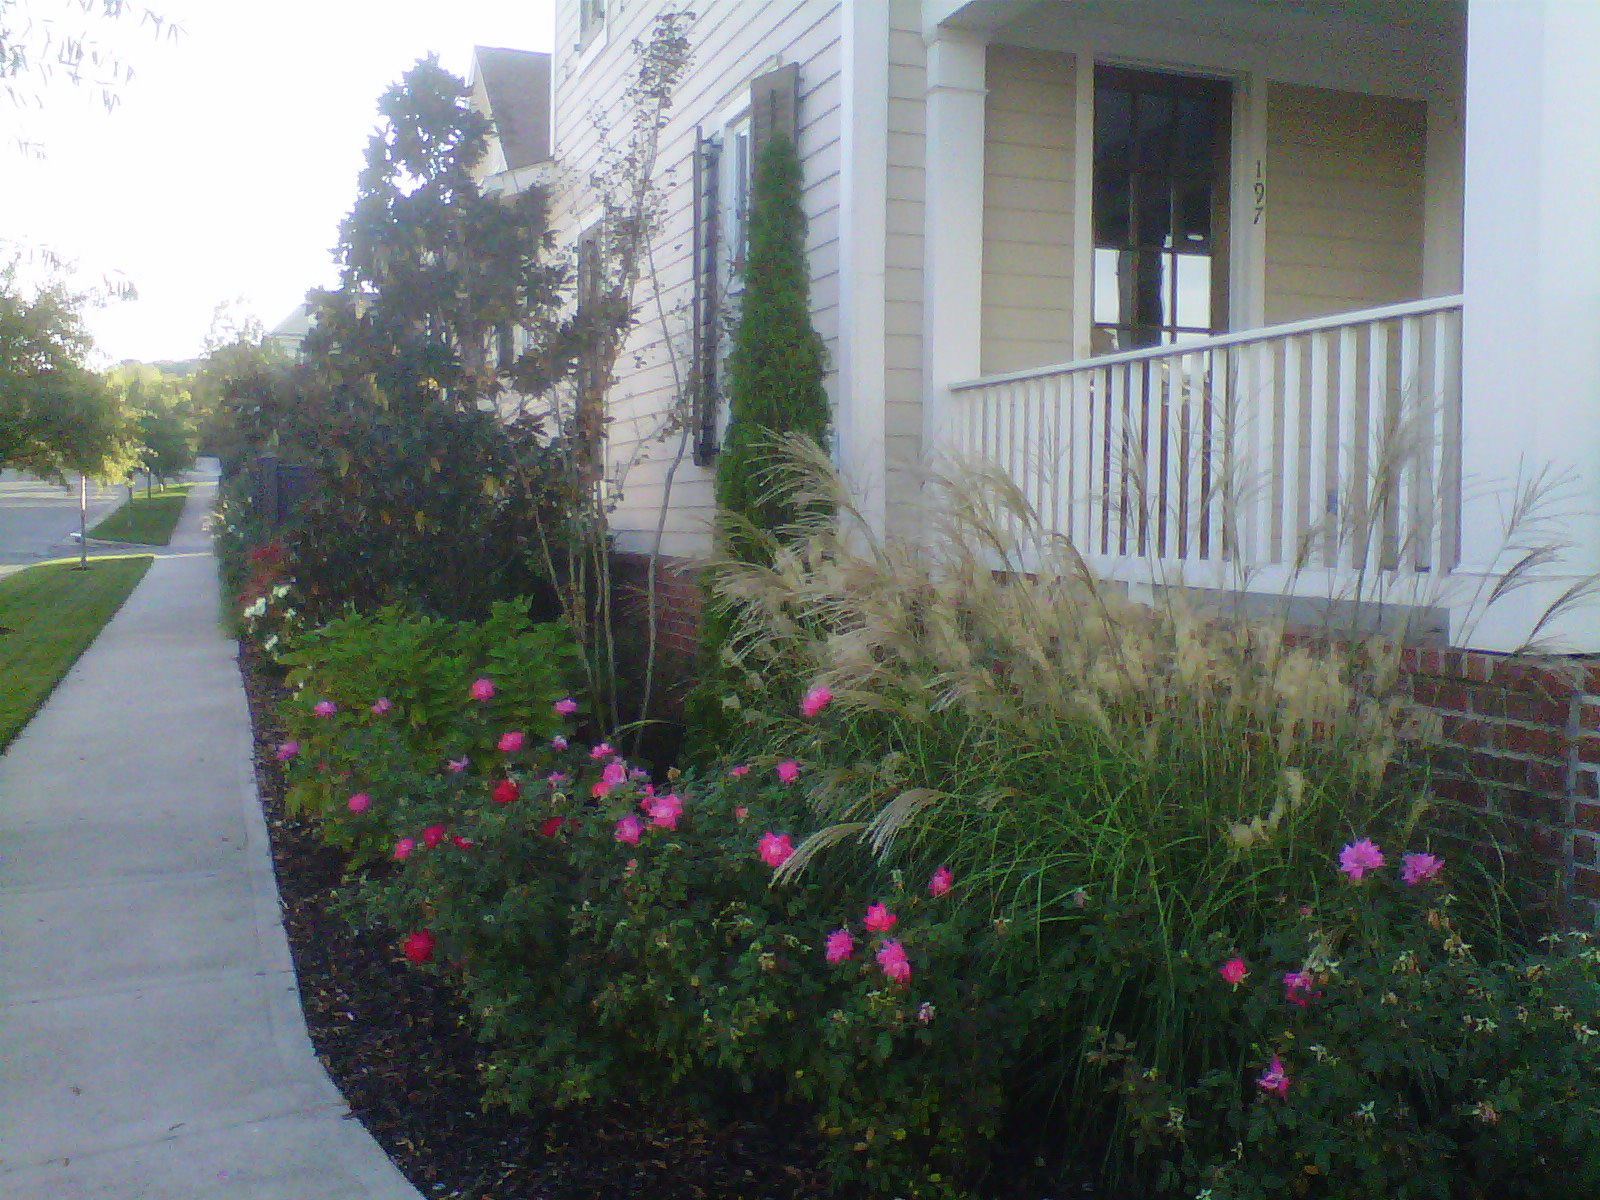 Justin Stelter Landscape Gardening - Modern Suburban Landscaping - 12591729973_f2a0c88c0c_o.jpg